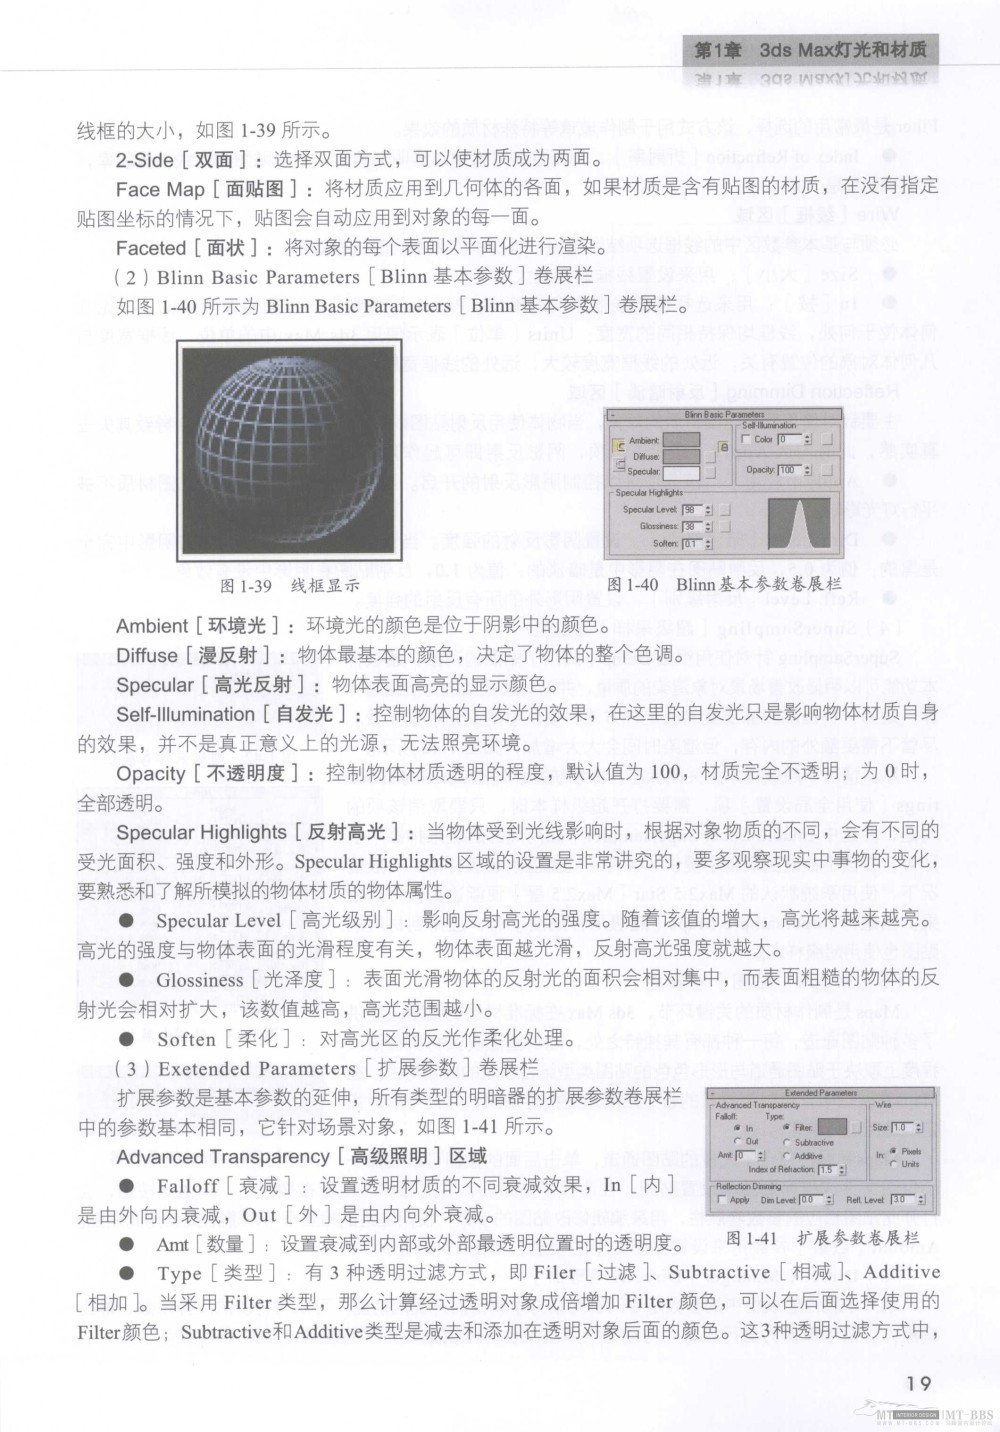 水晶石技法-3ds_Max&VRay室内空间表现_水晶石技法-3ds_Max&VRay室内空间表现_页面_025.jpg